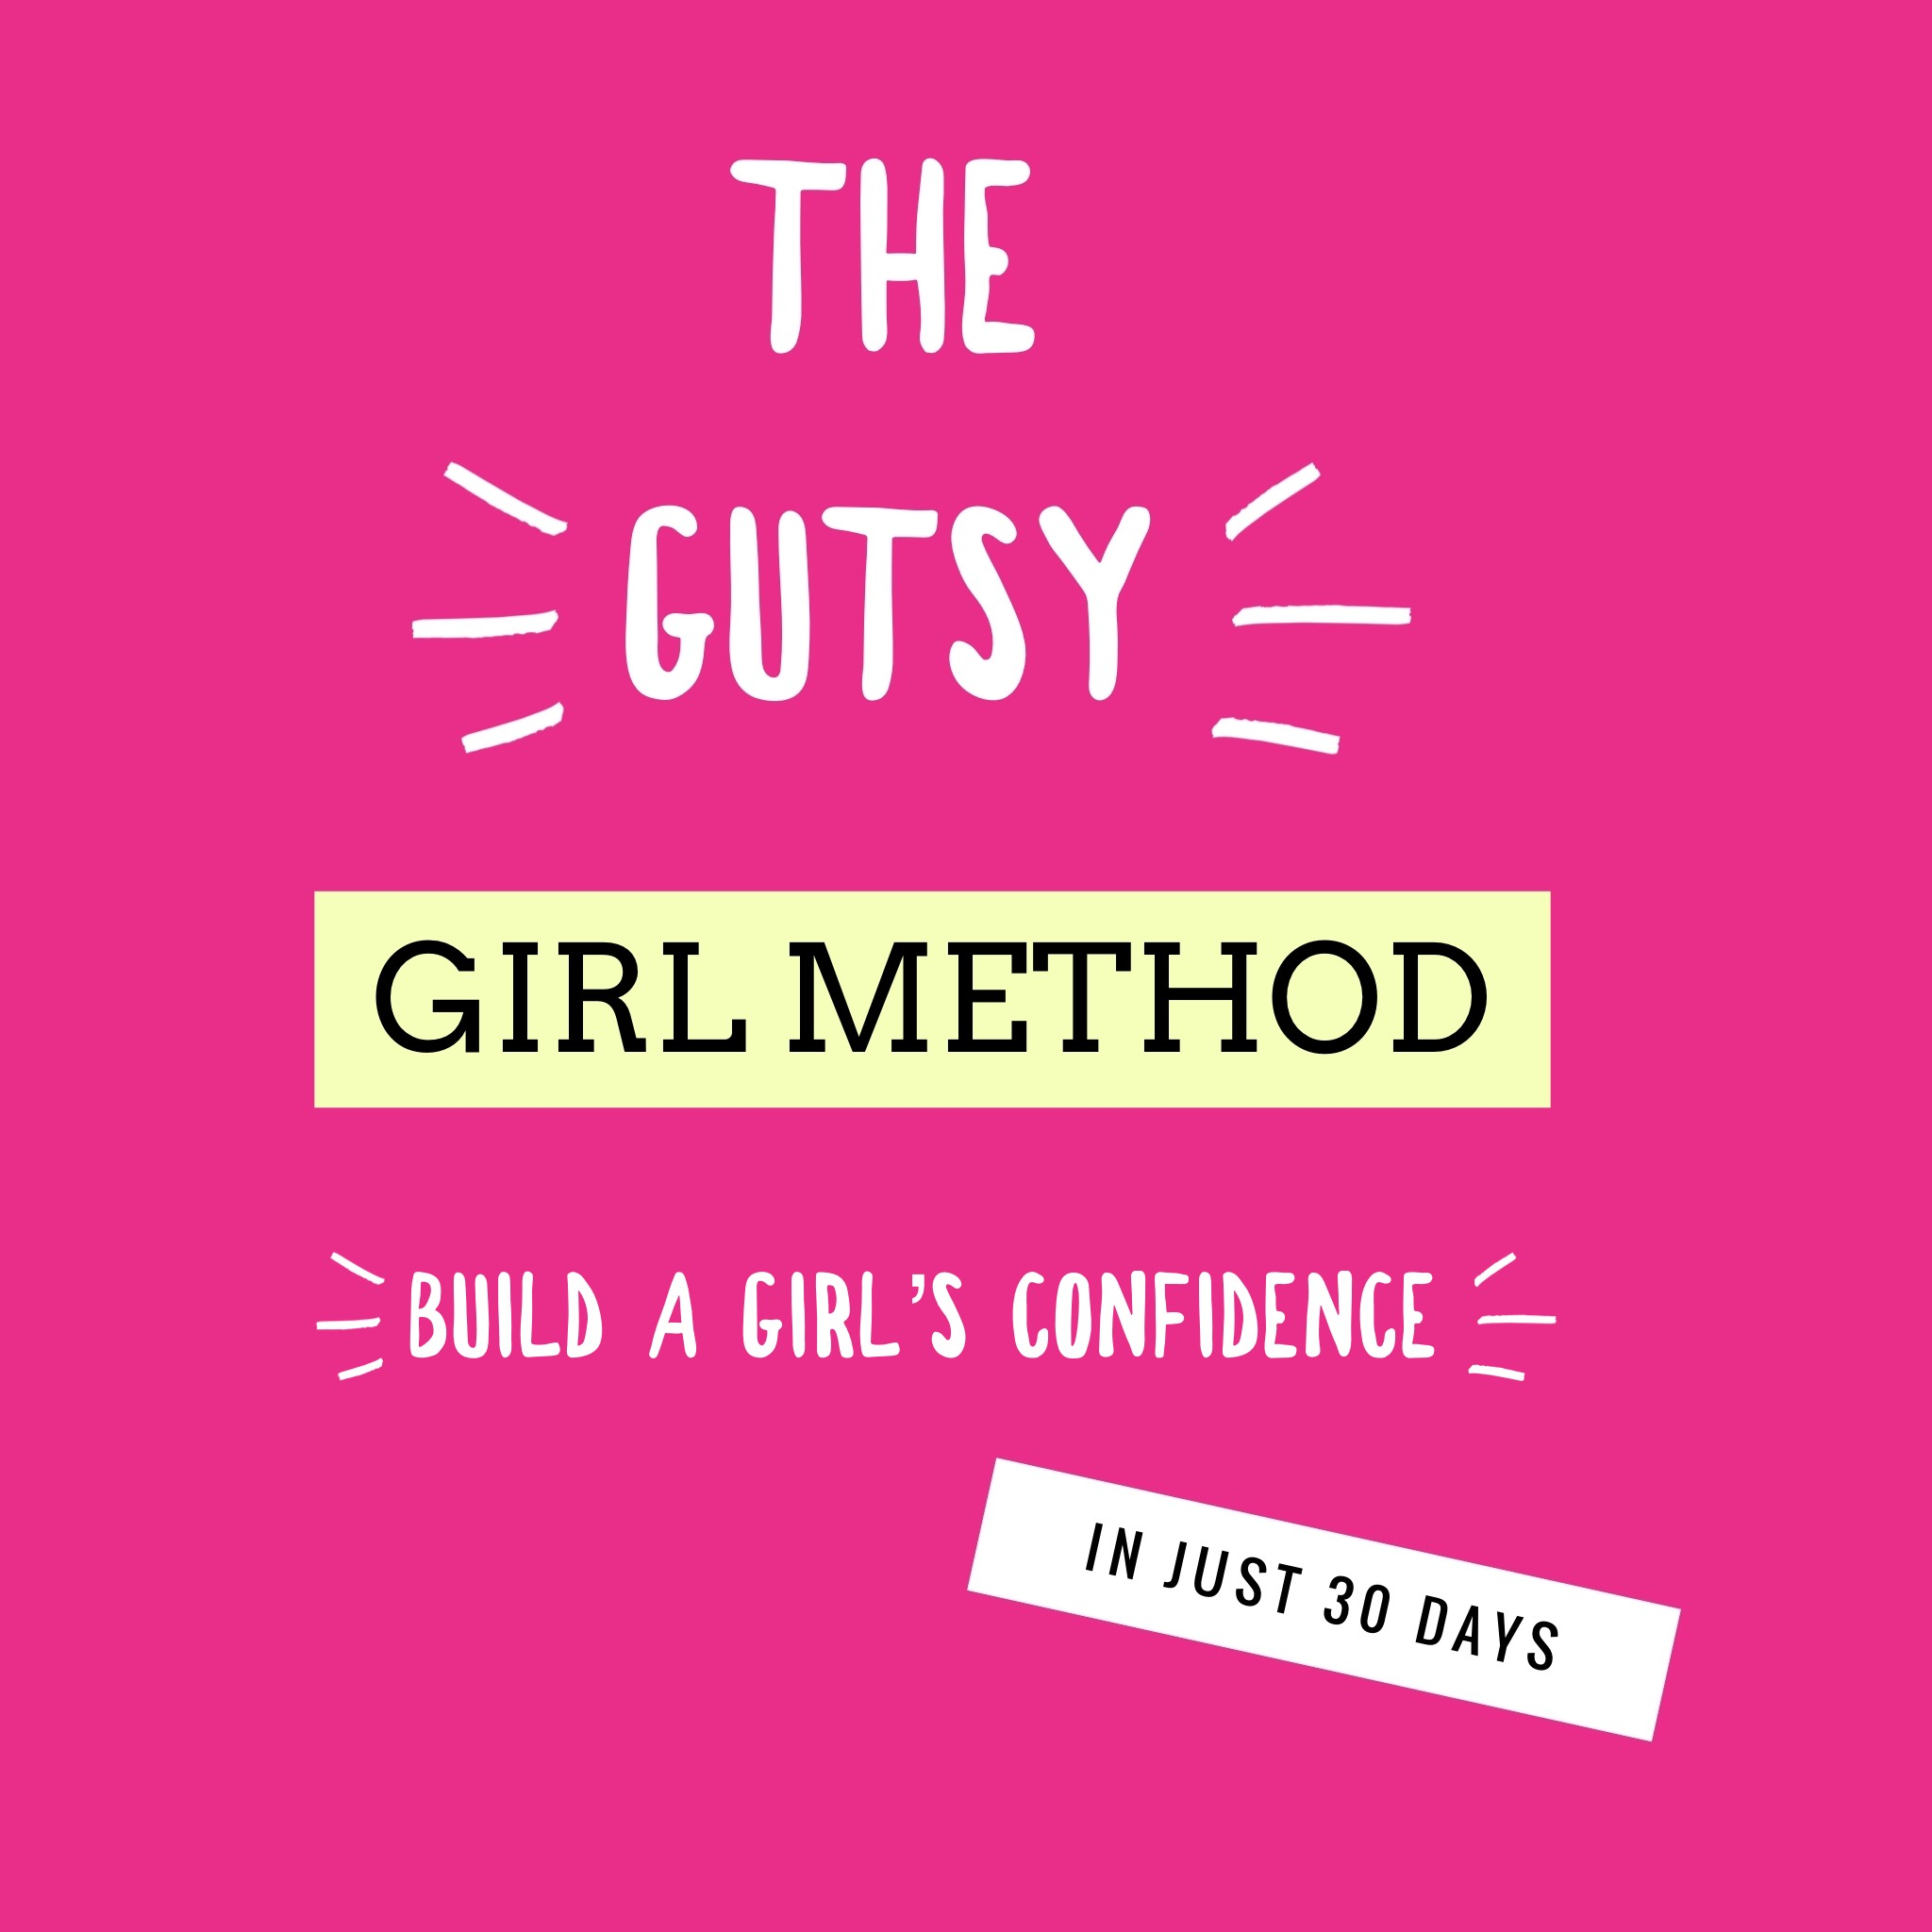 the-gutsy-girl-method-gutsygirlclub.jpg